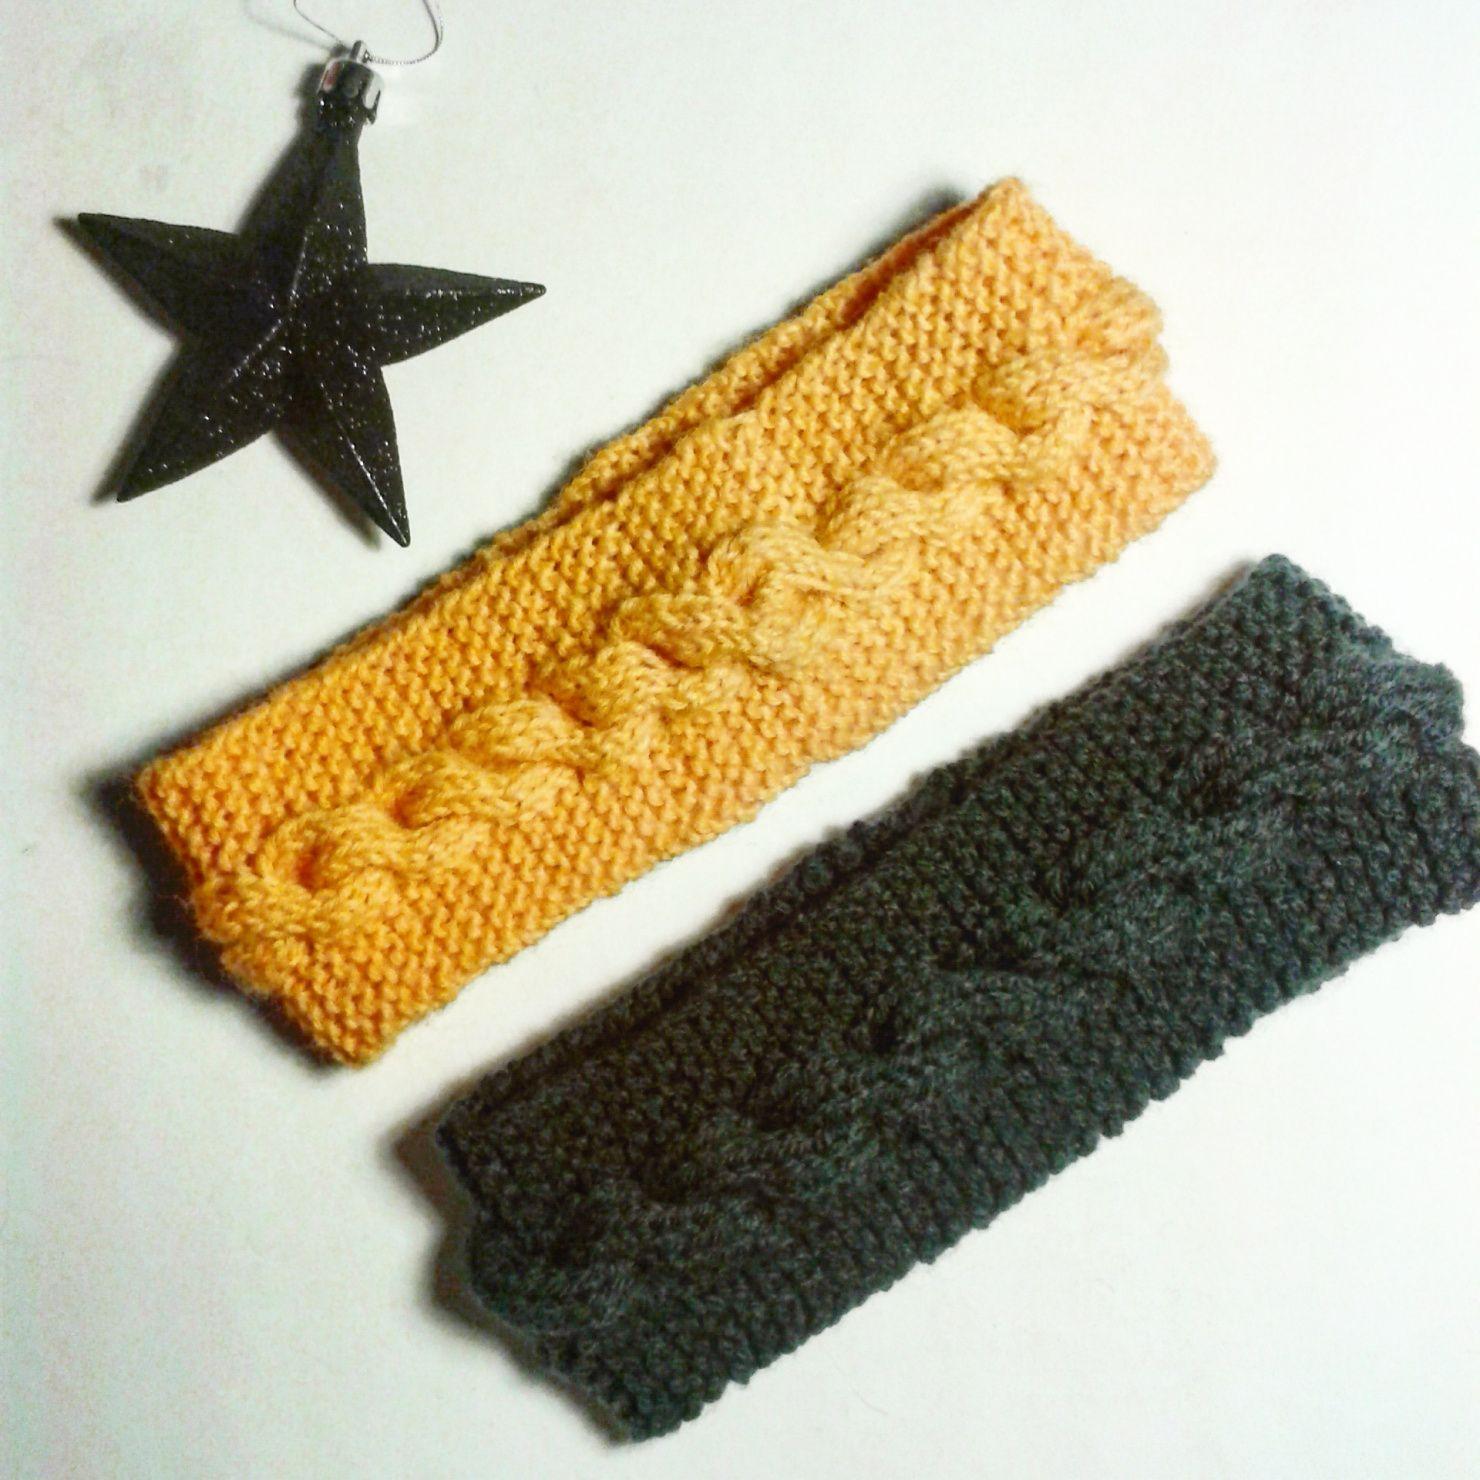 headband la tornade tricot pinterest tricot tuto et tuto headband. Black Bedroom Furniture Sets. Home Design Ideas